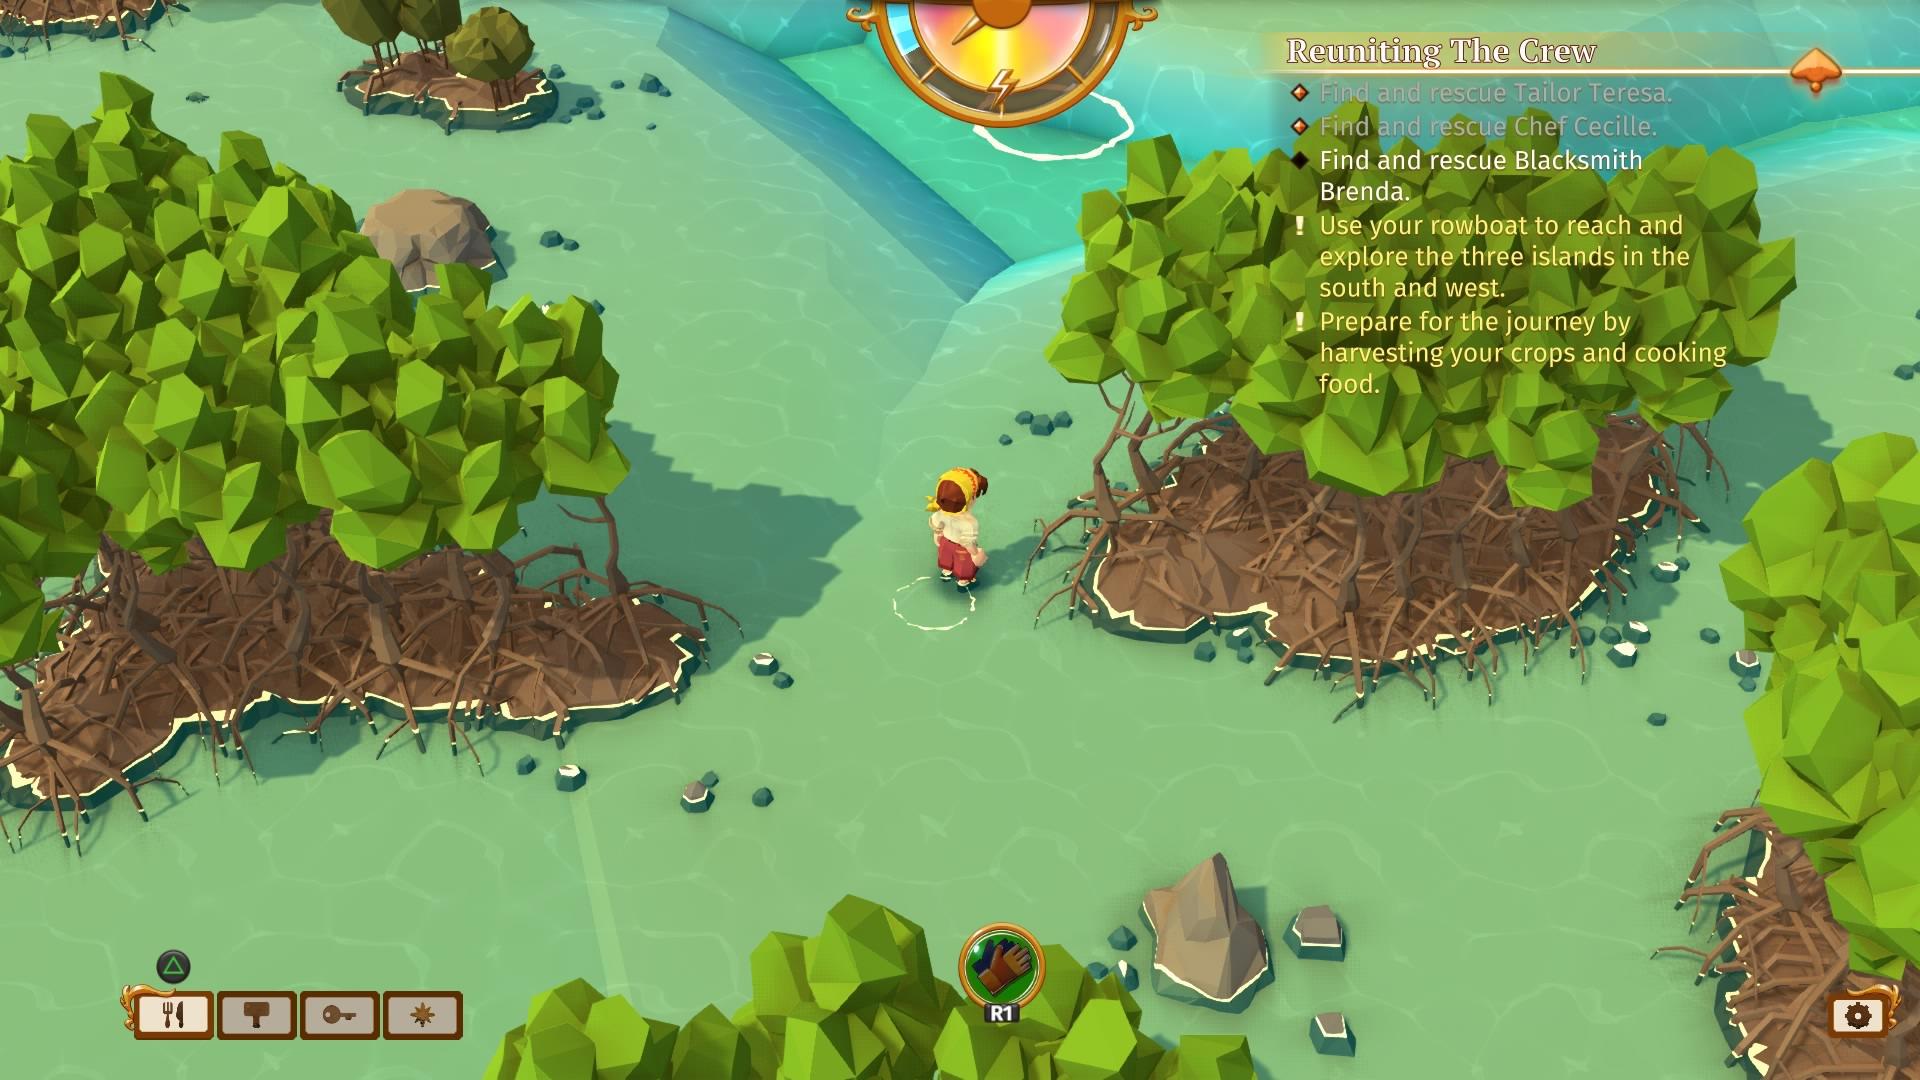 بررسی بازی Stranded Sails: Explorers of the Cursed Islands